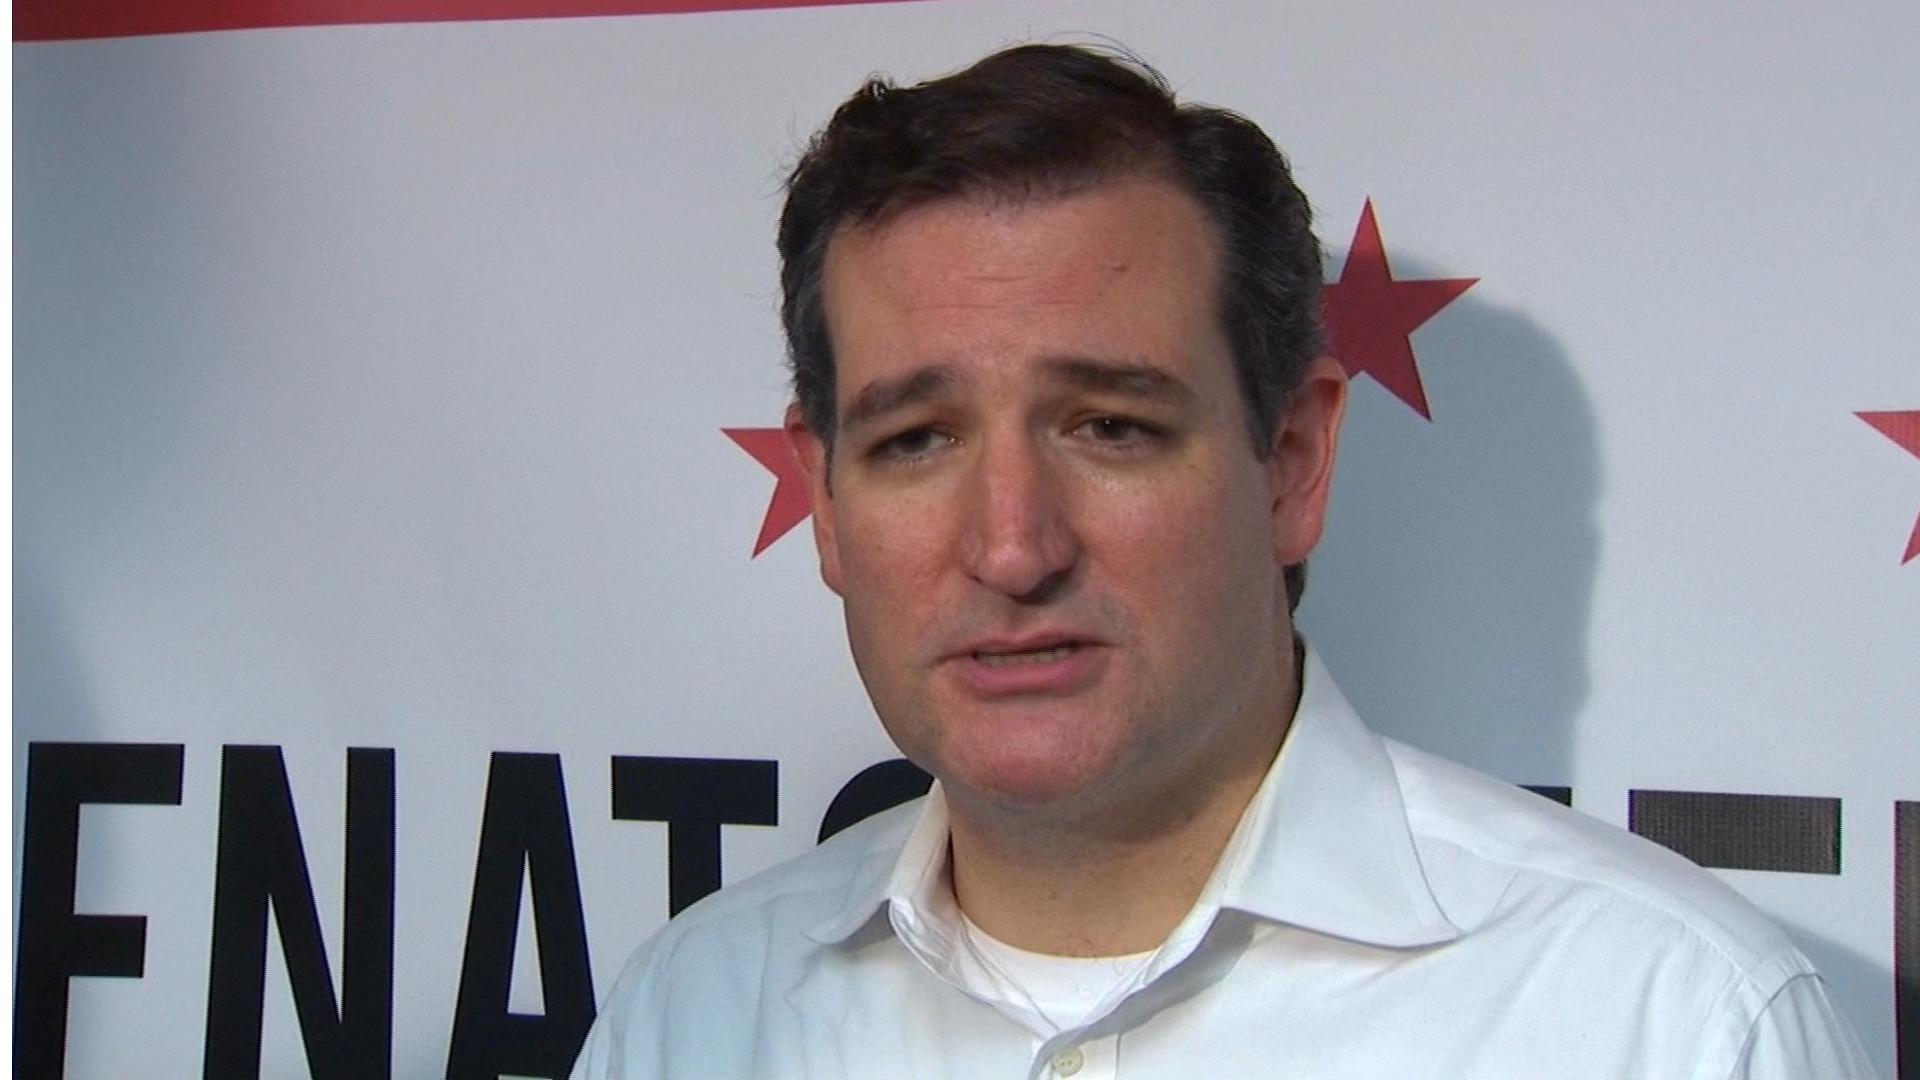 Cruz's Texas two-step on health care